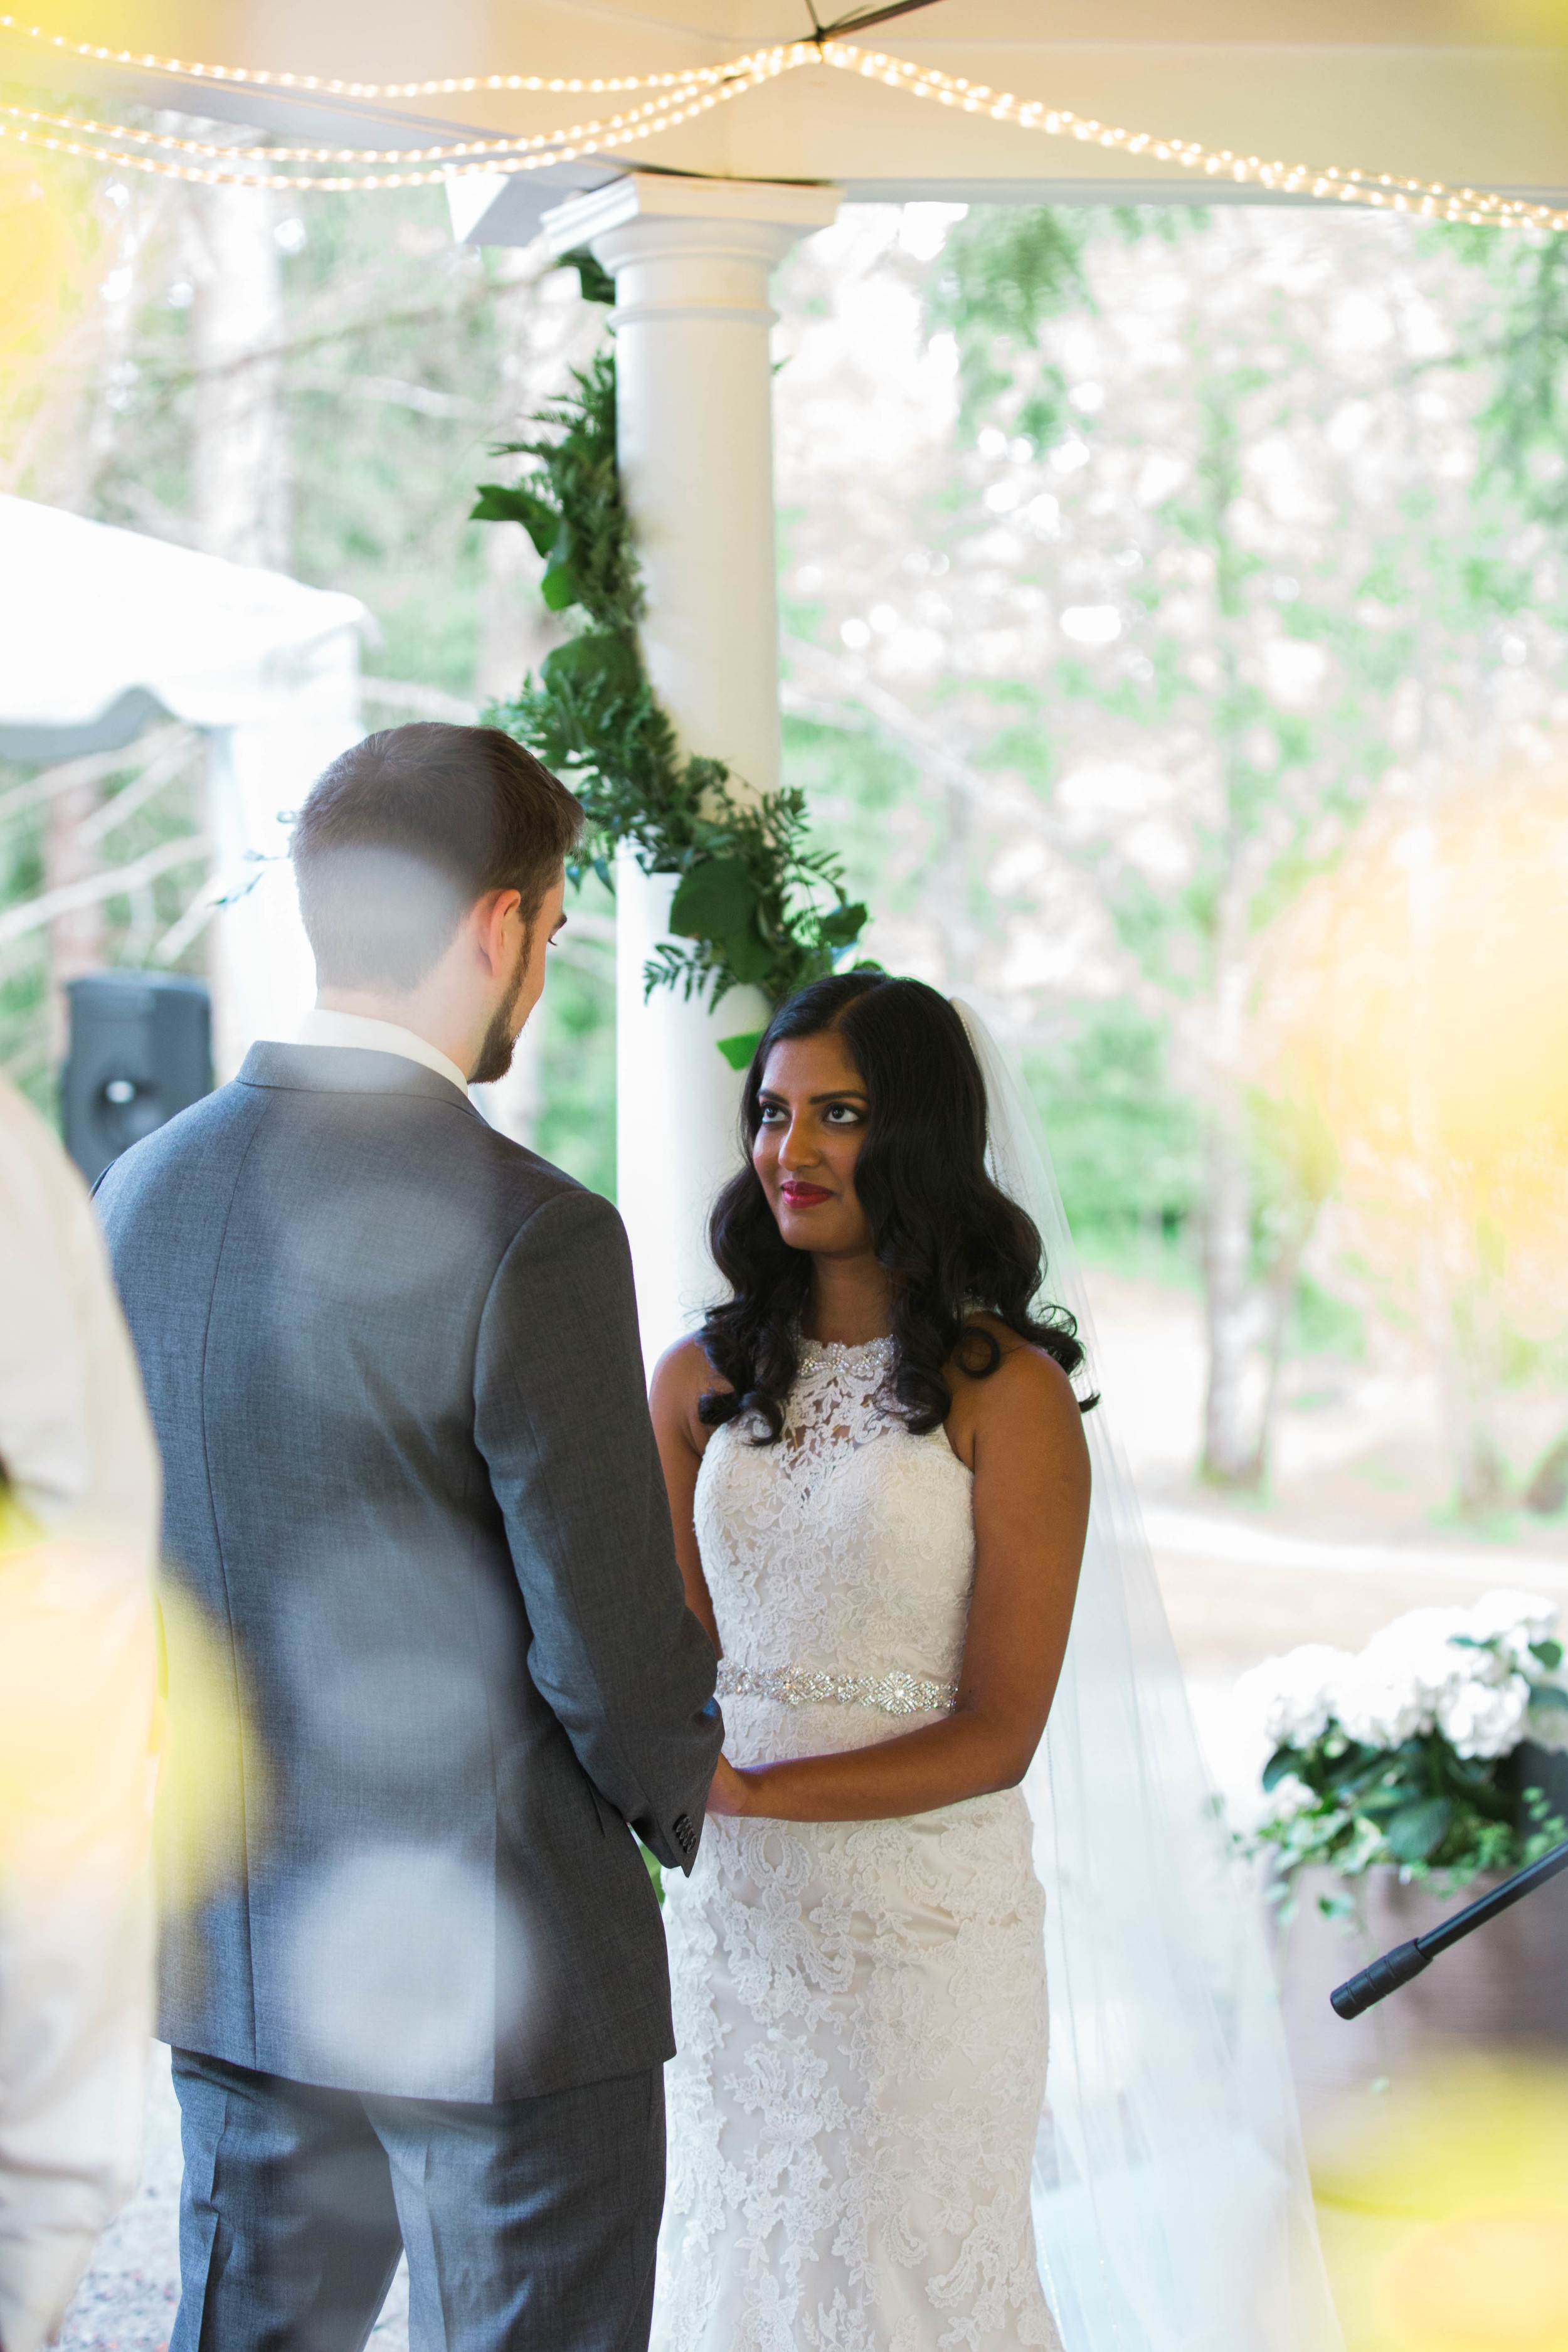 Hima+Dan_Wedding_Seattle+Couple_Kingston_6112016_1739.jpg